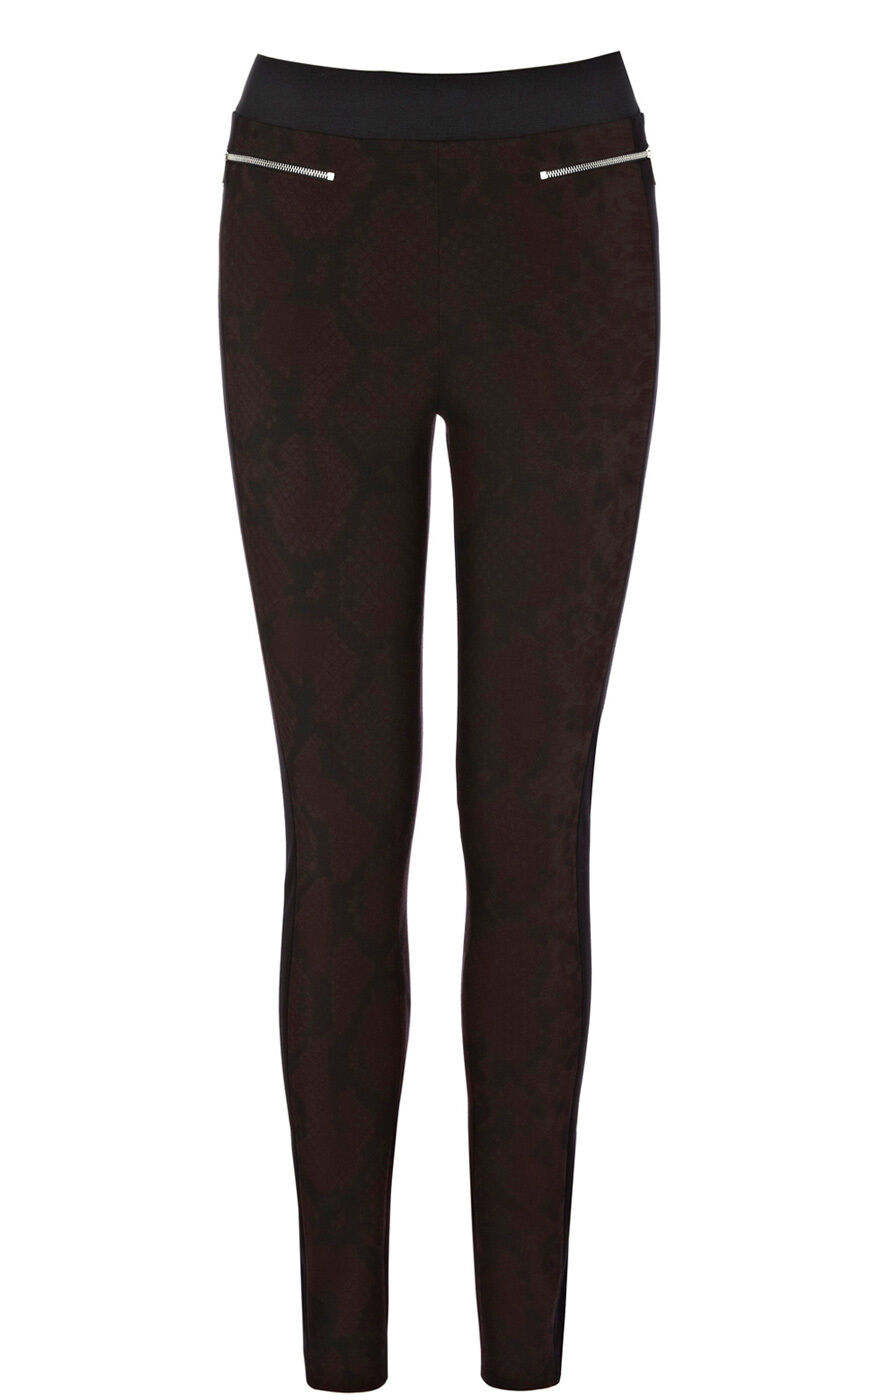 Karen Millen Snake Print schwarz Super Skinny Zip Jegging Stretch Trousers 8 36